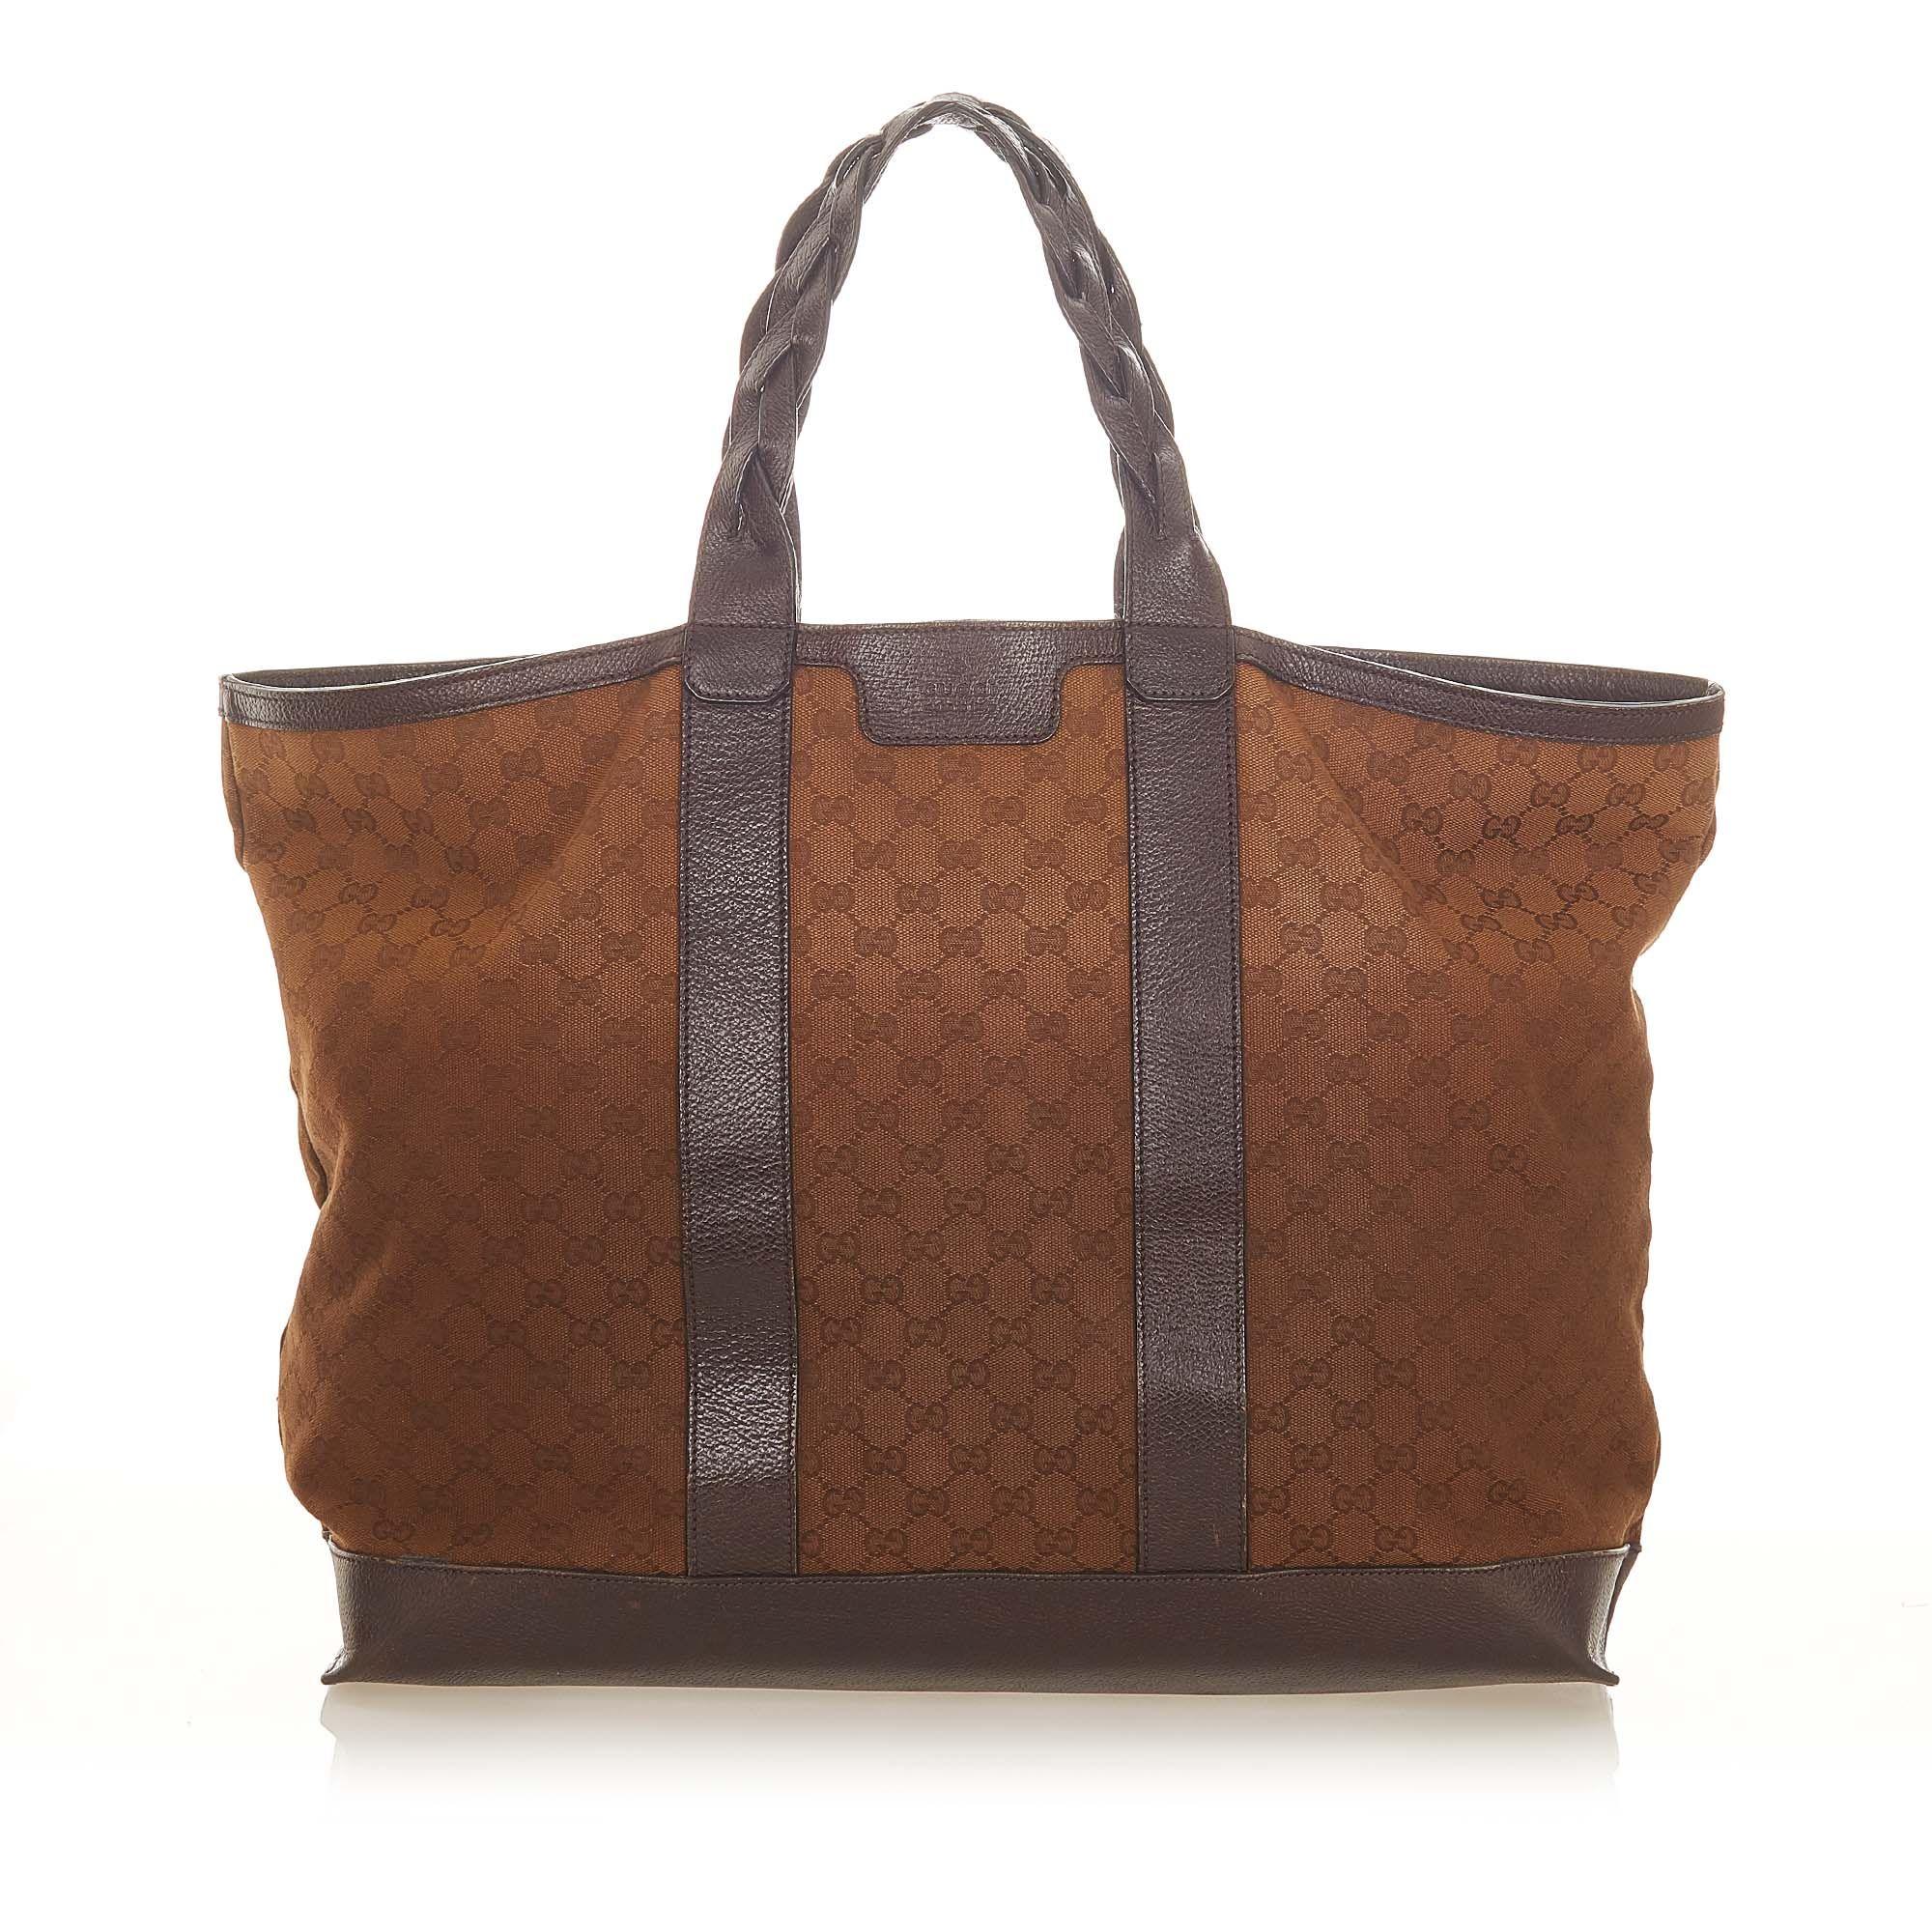 Vintage Gucci GG Canvas Duffle Bag Brown